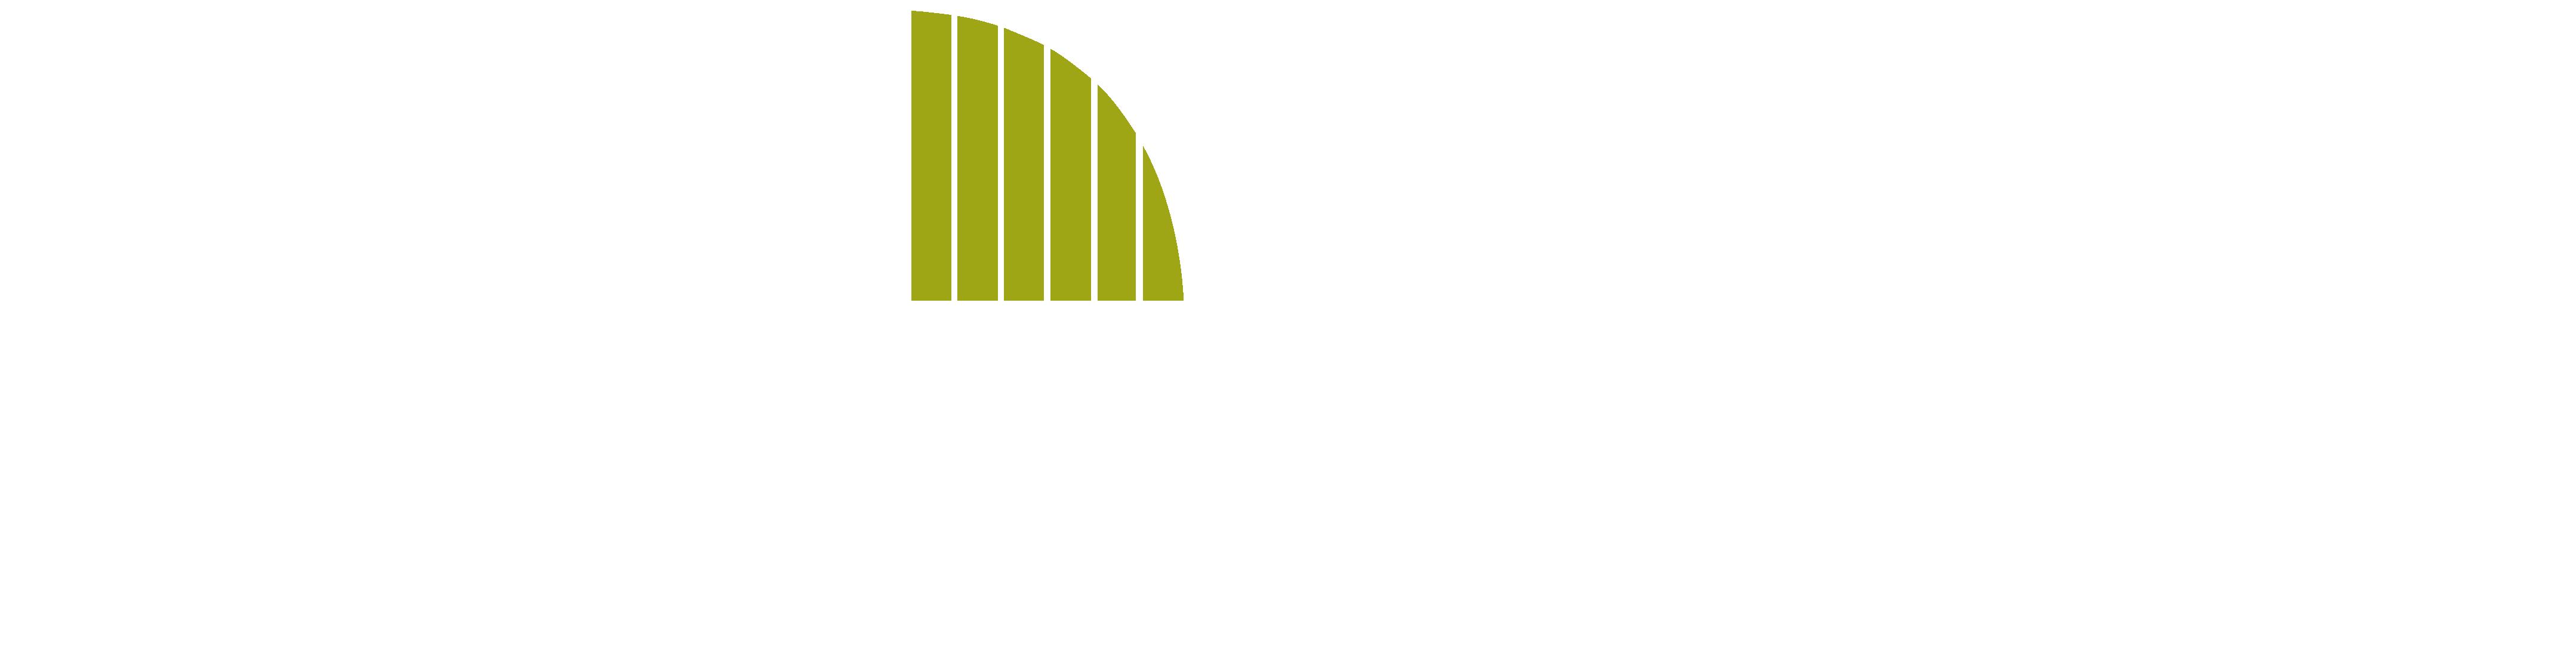 new creation decks logo - white